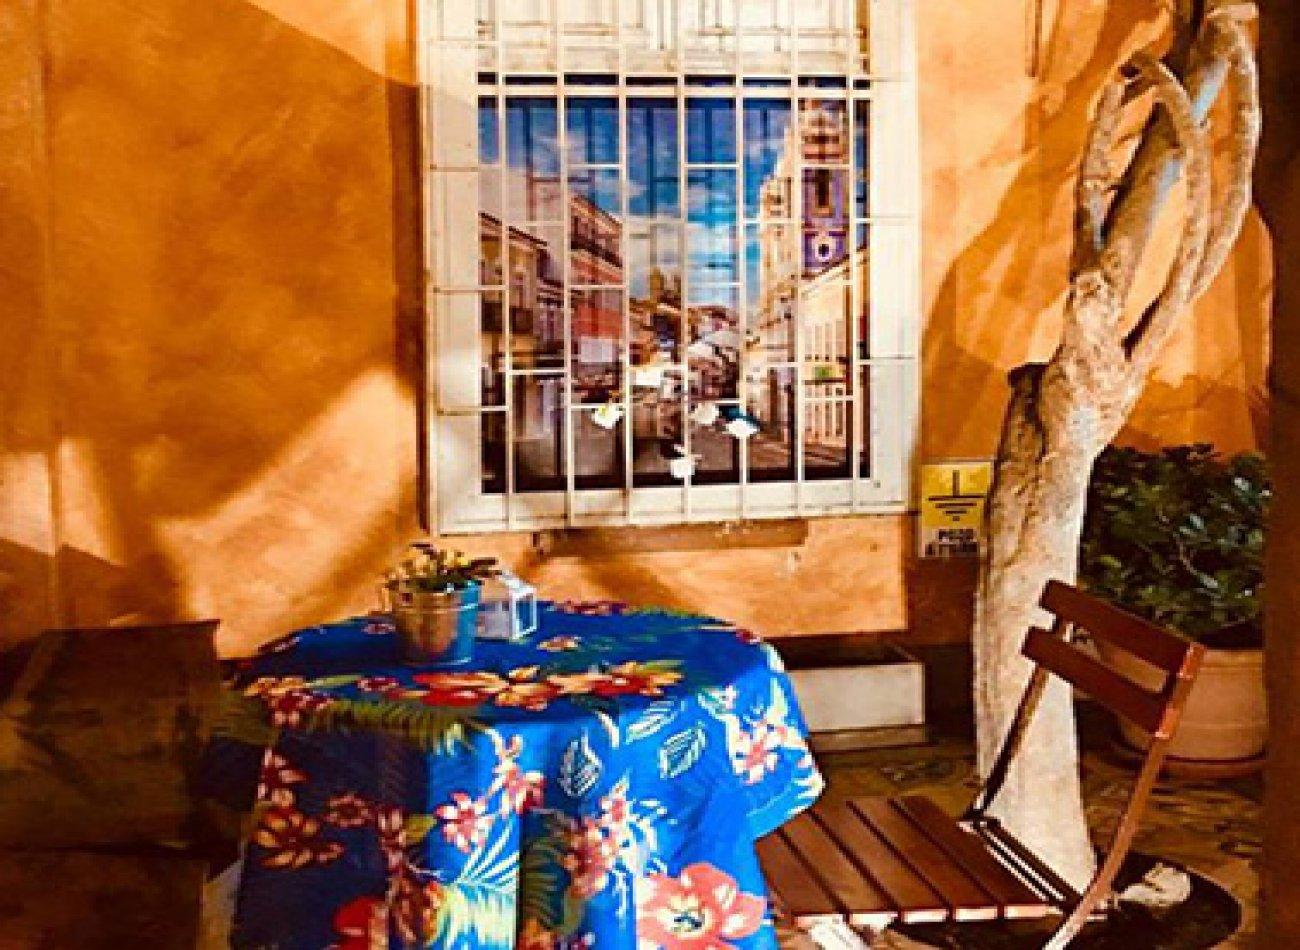 MARIA PANELA Restaurant - and Peruvian Food AUTHOR - MIRAFLORES - MESA 24/7 Guide | LIMA - Peru